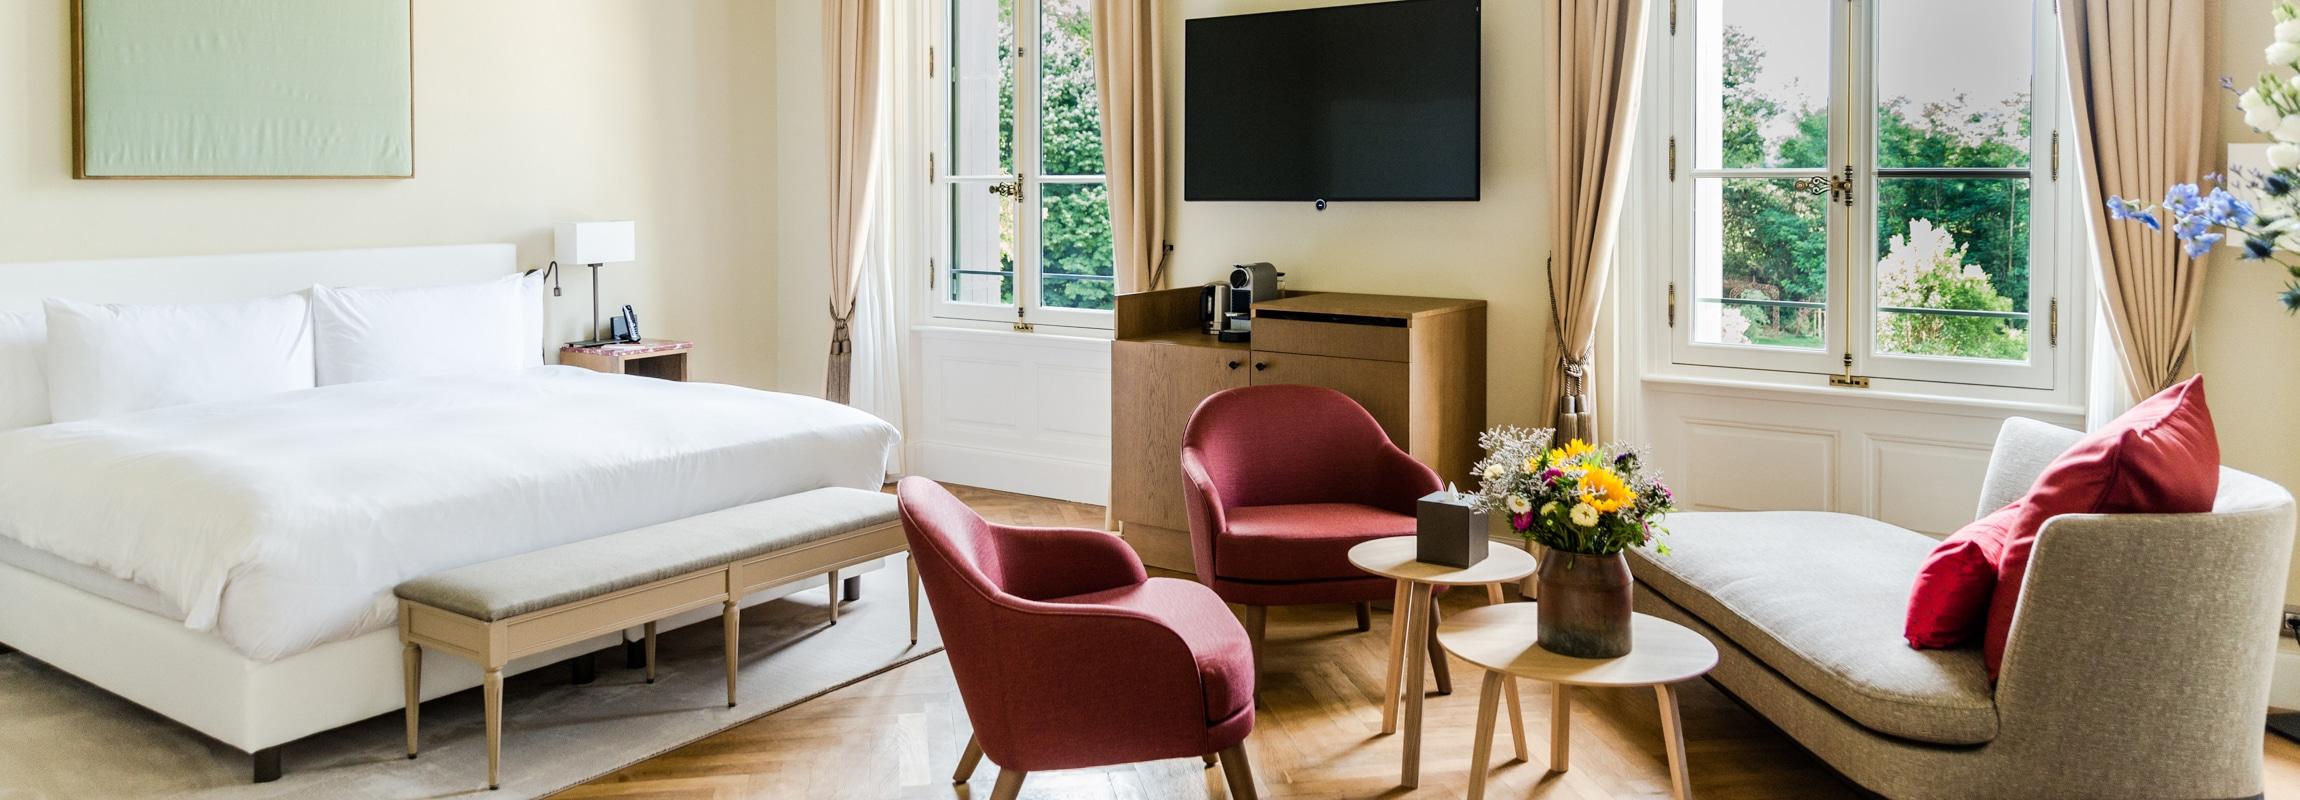 Château de Montcaud, Hotel Provence, Junior Suites